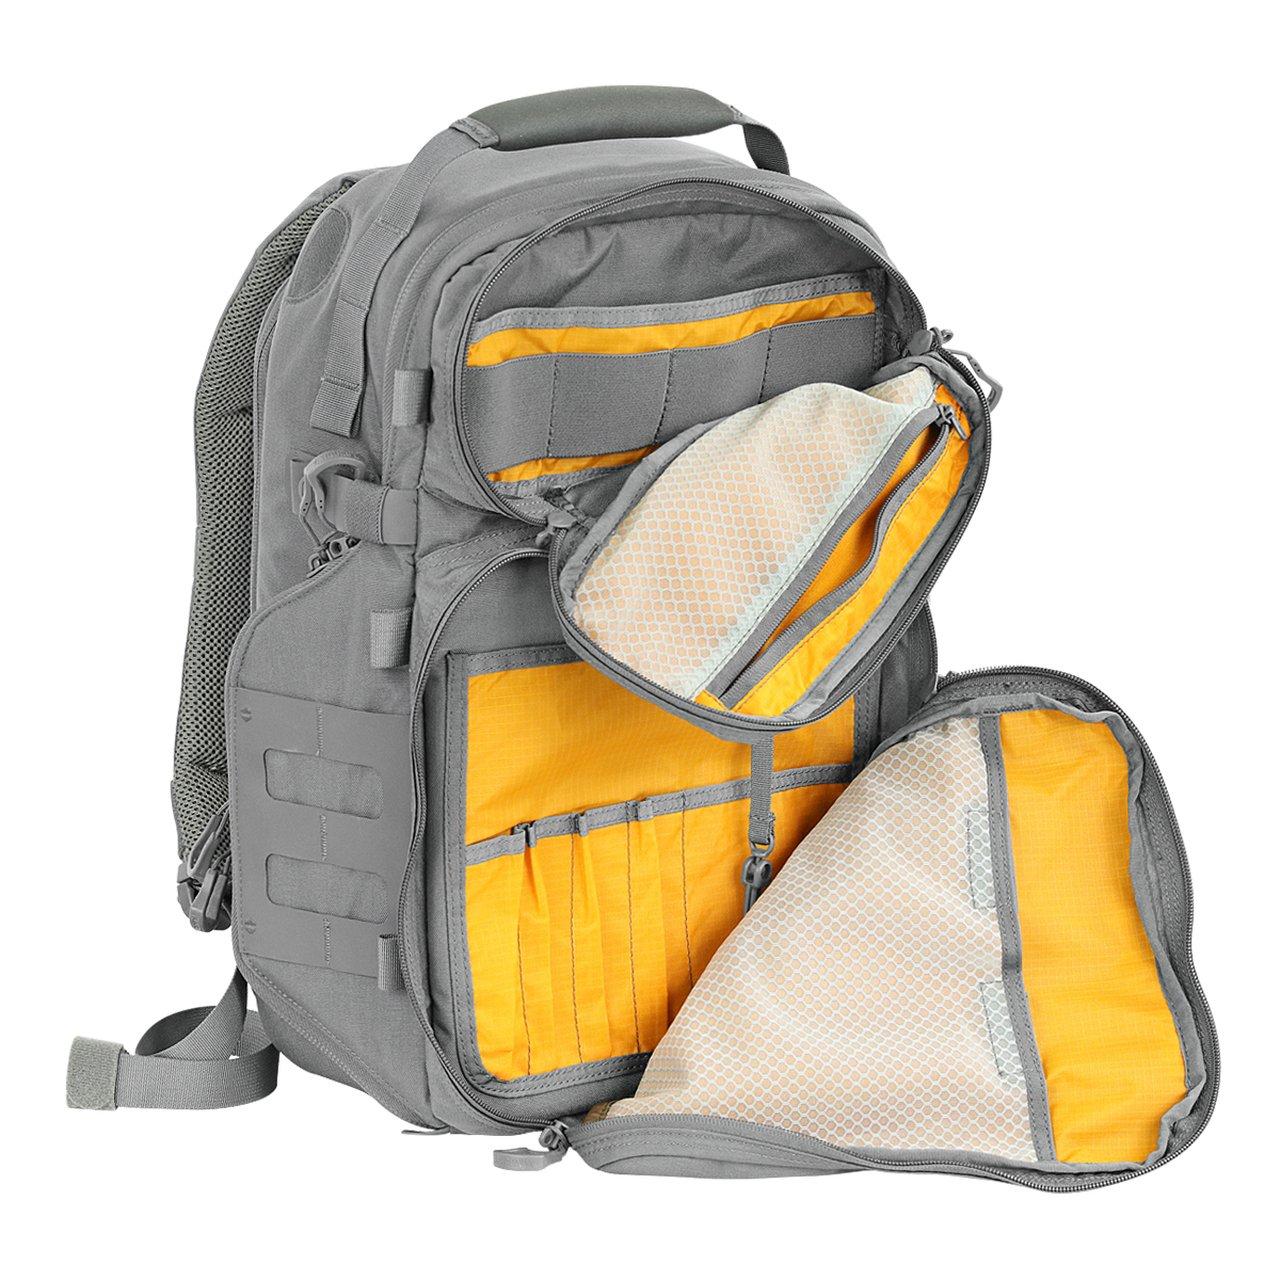 Balo VANQUEST TRIDENT-21 (Gen-3) Backpack – Black